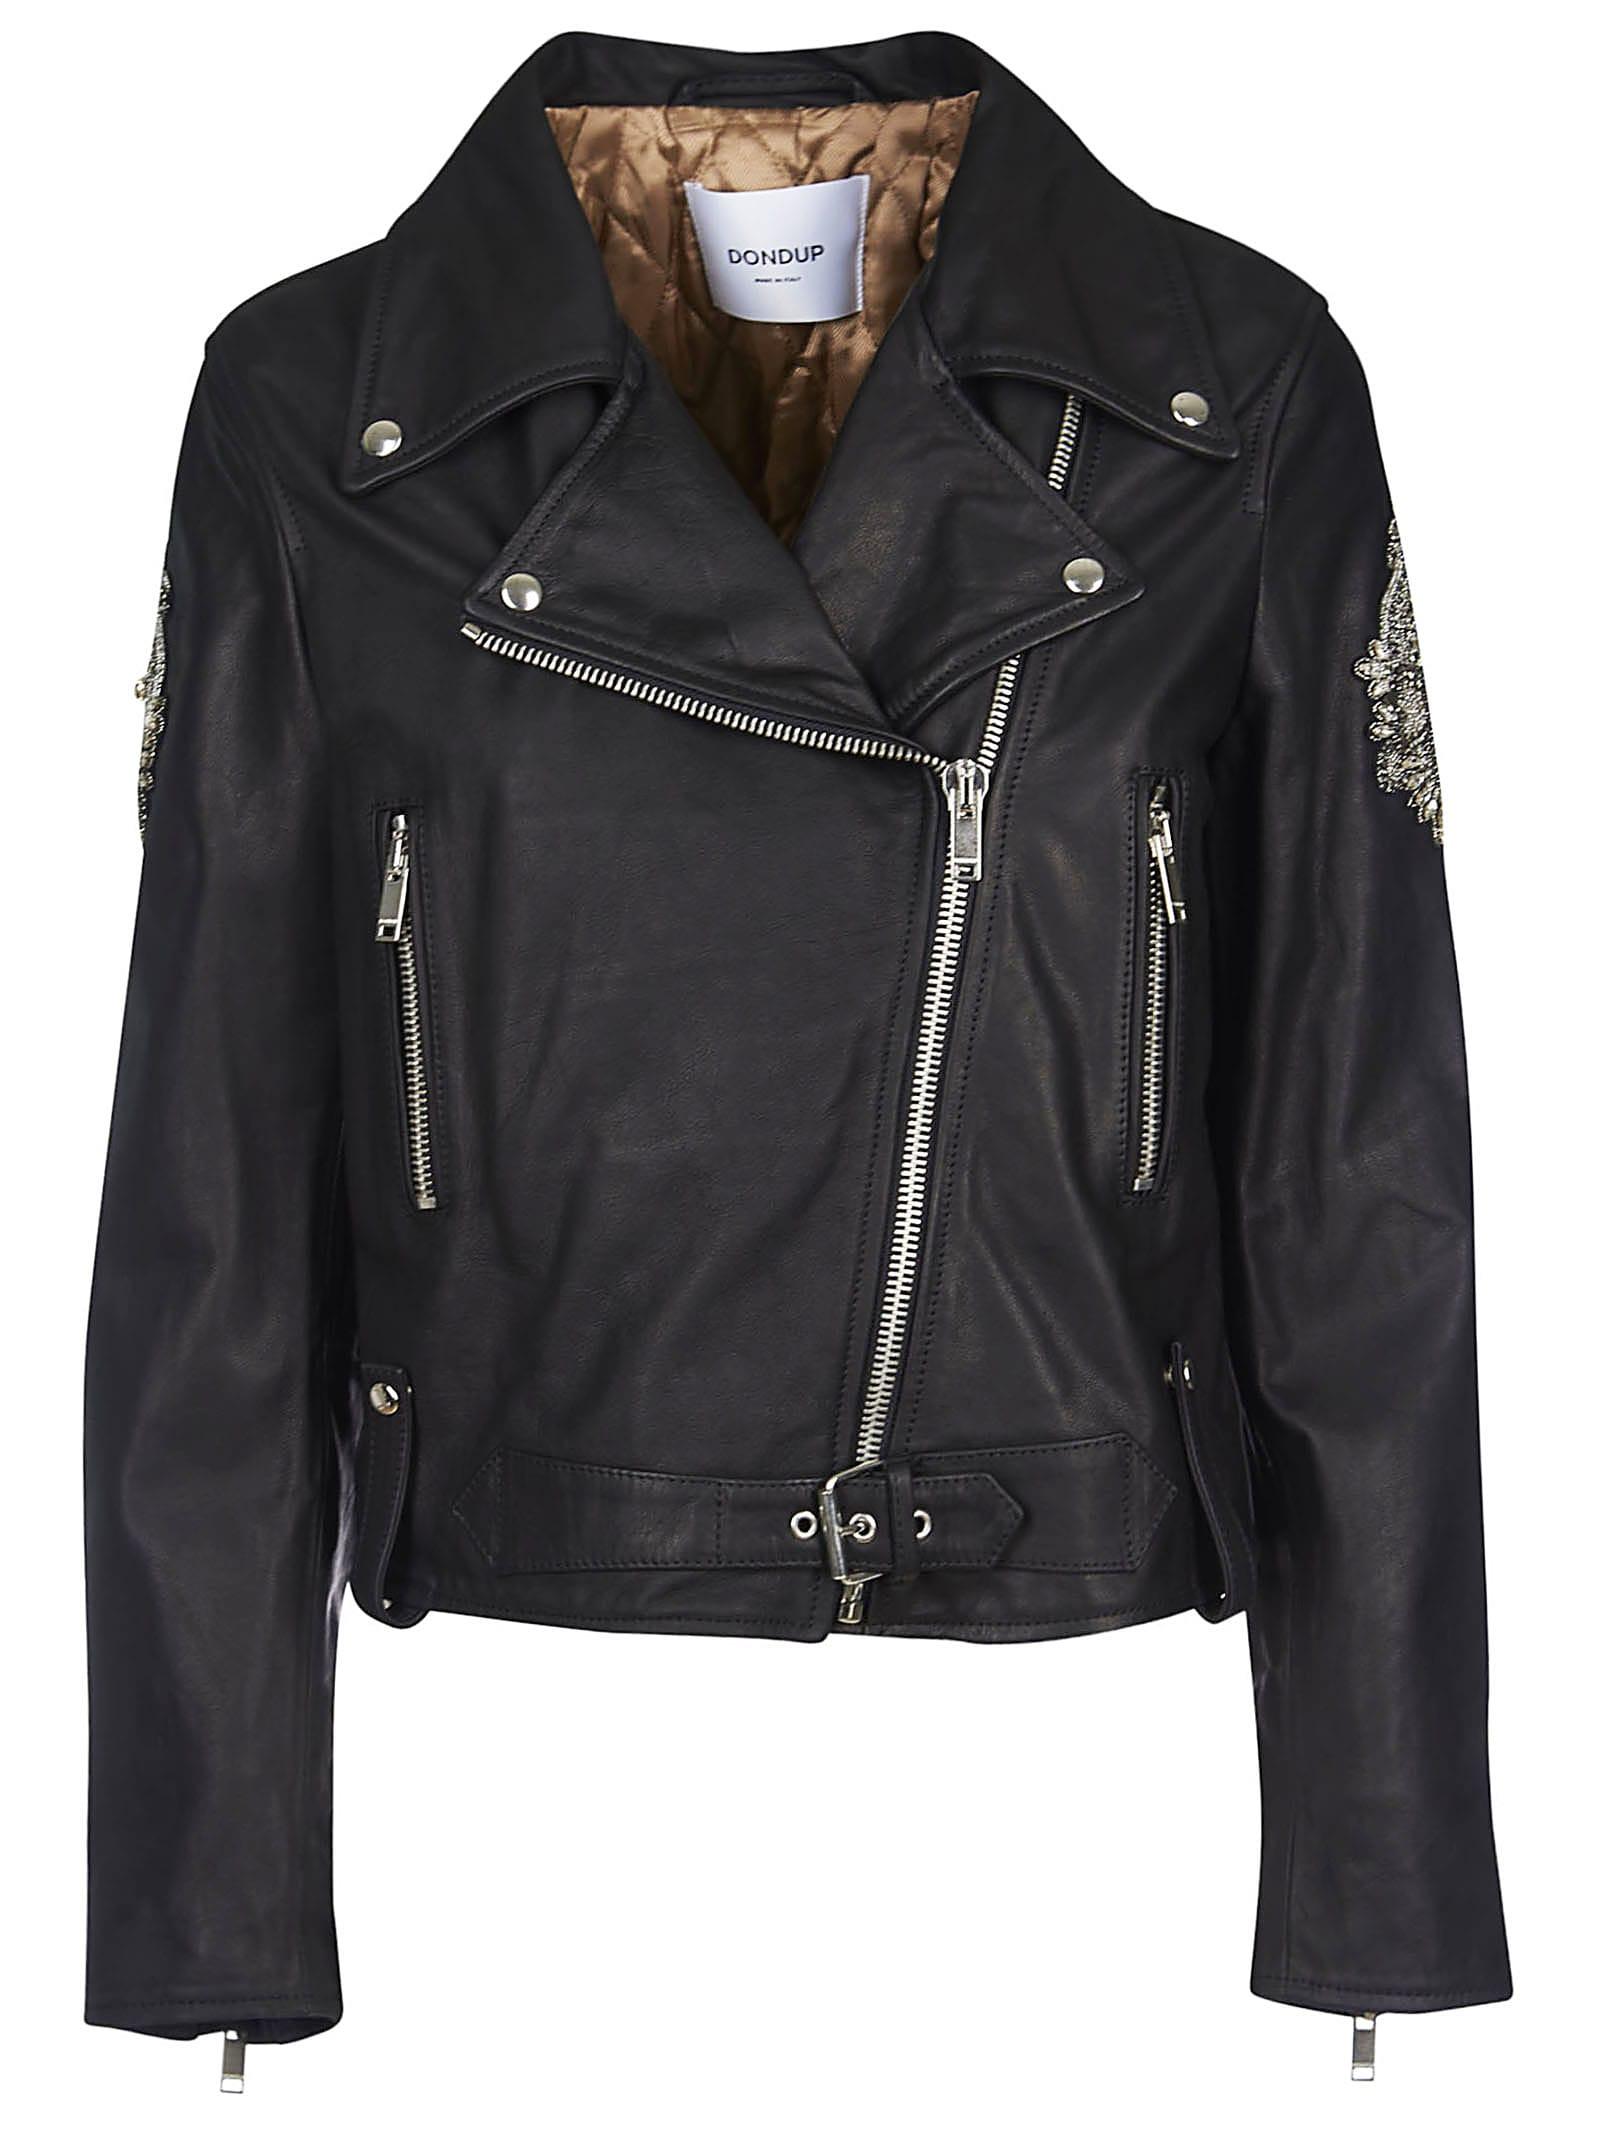 good service official price recognized brands Best price on the market at italist   Dondup Dondup Embellished Biker Jacket